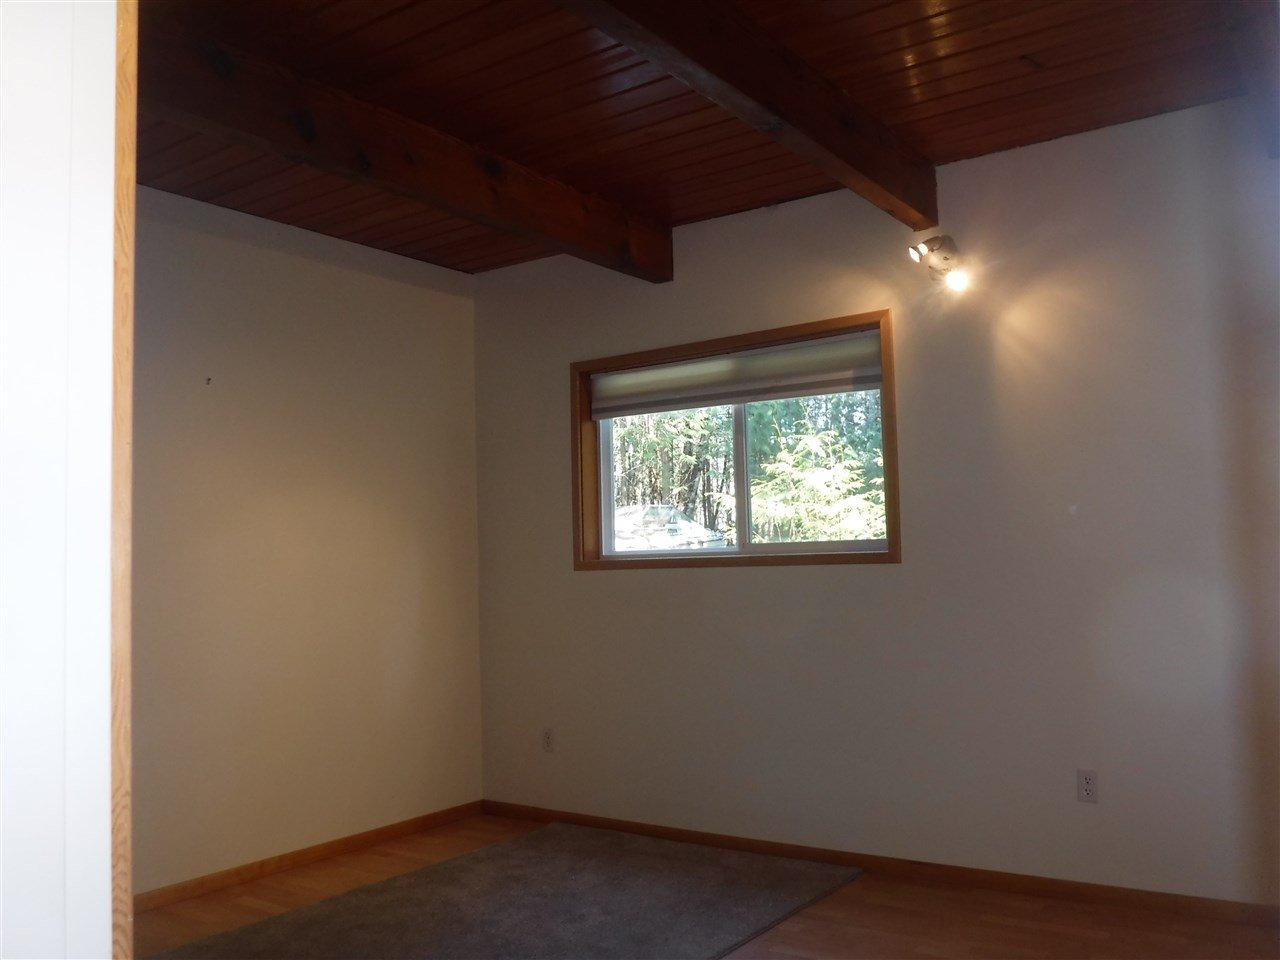 Photo 7: Photos: 2860 NE HALF MOON Drive in Bella Coola: Bella Coola/Hagensborg House for sale (Williams Lake (Zone 27))  : MLS®# R2451043